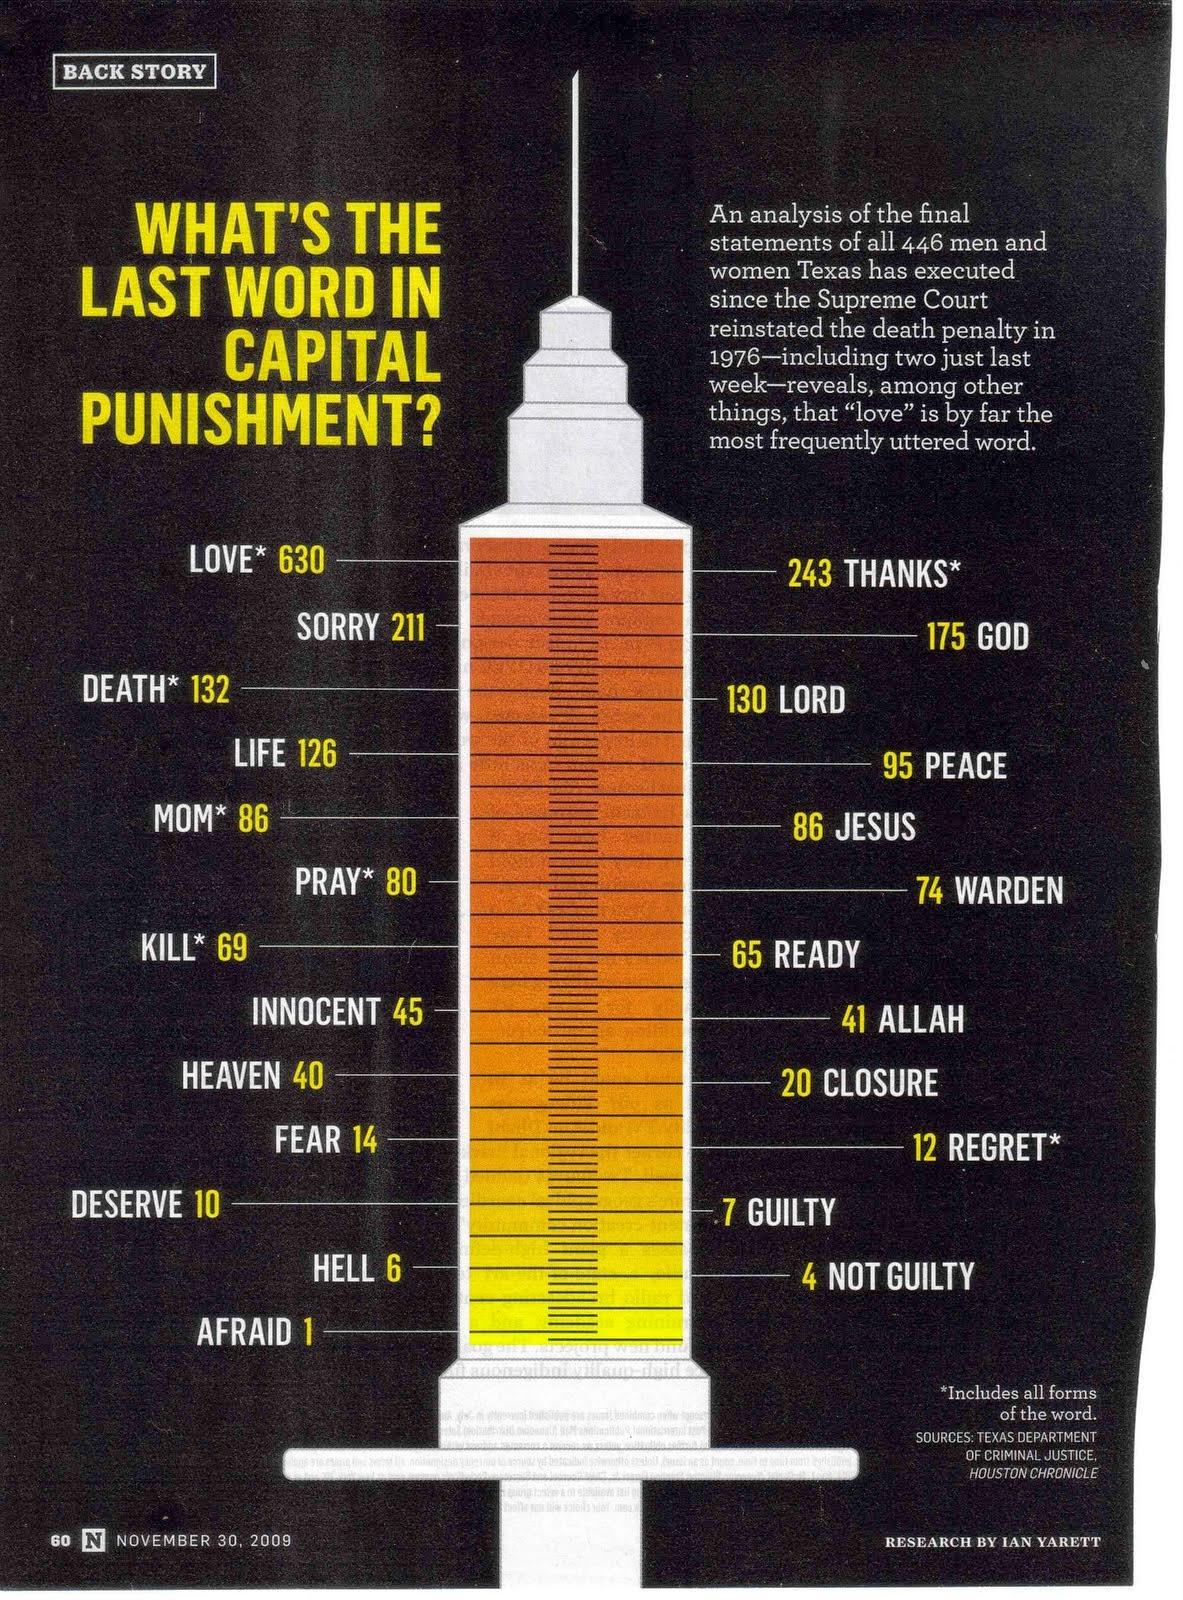 Capital Punishment: Retribution or Justice?